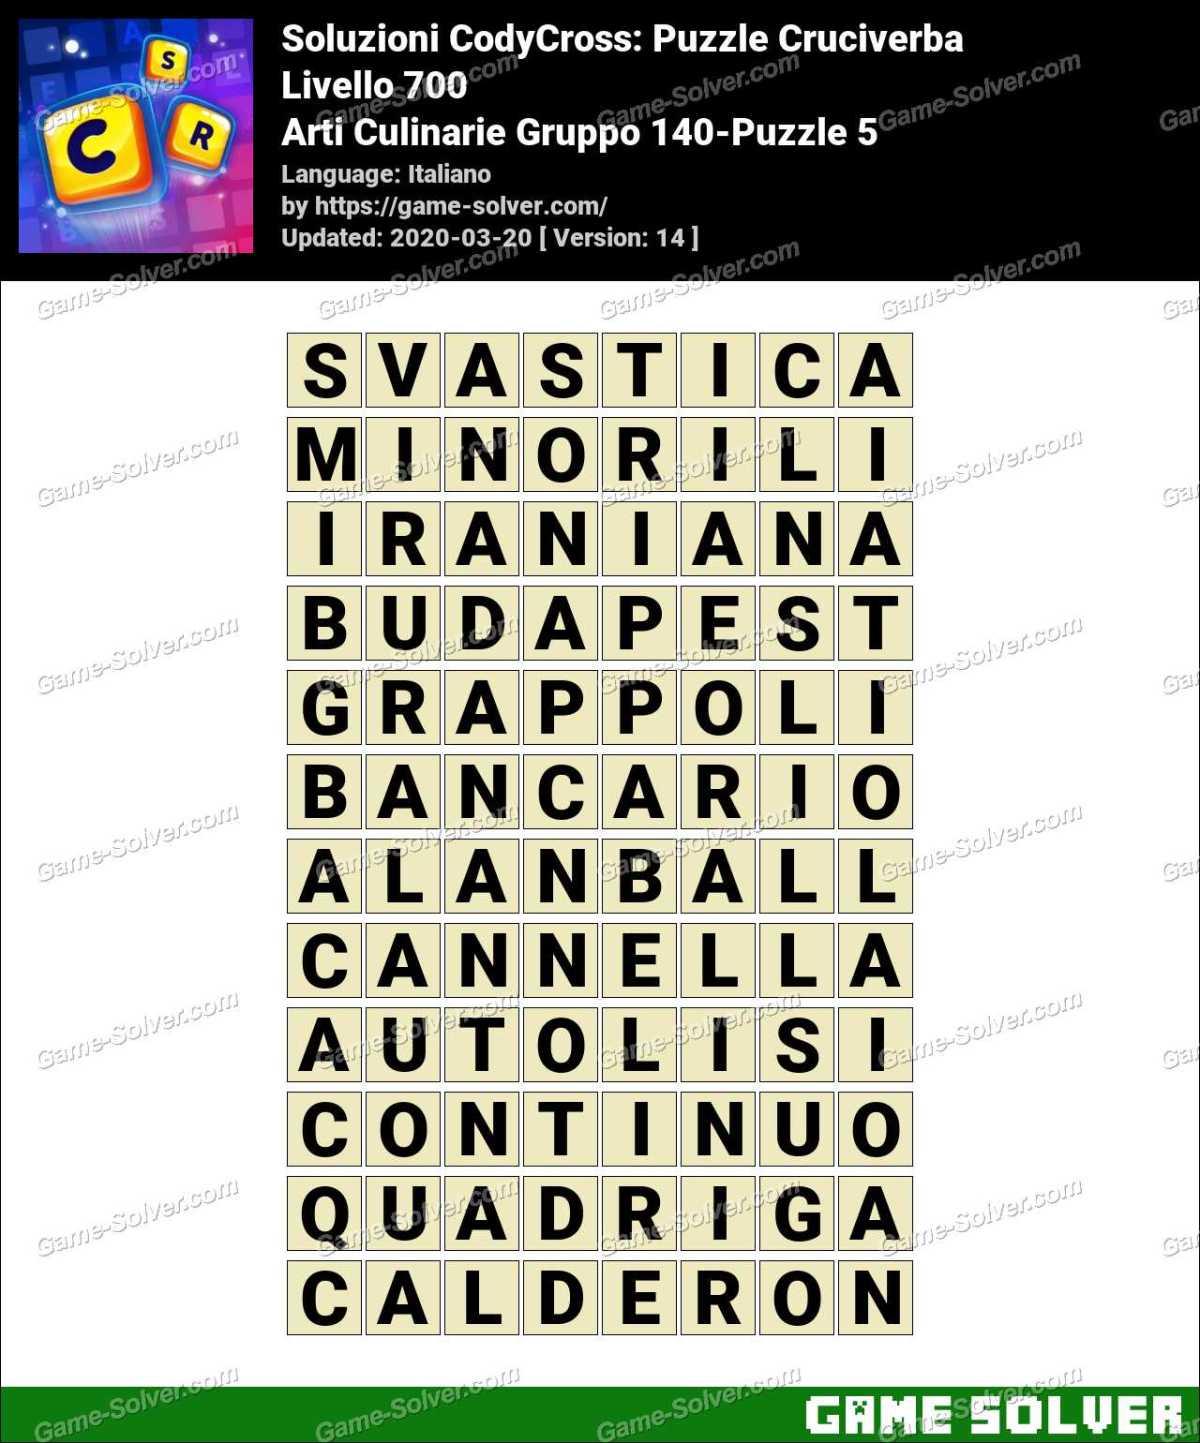 Soluzioni CodyCross Arti Culinarie Gruppo 140-Puzzle 5